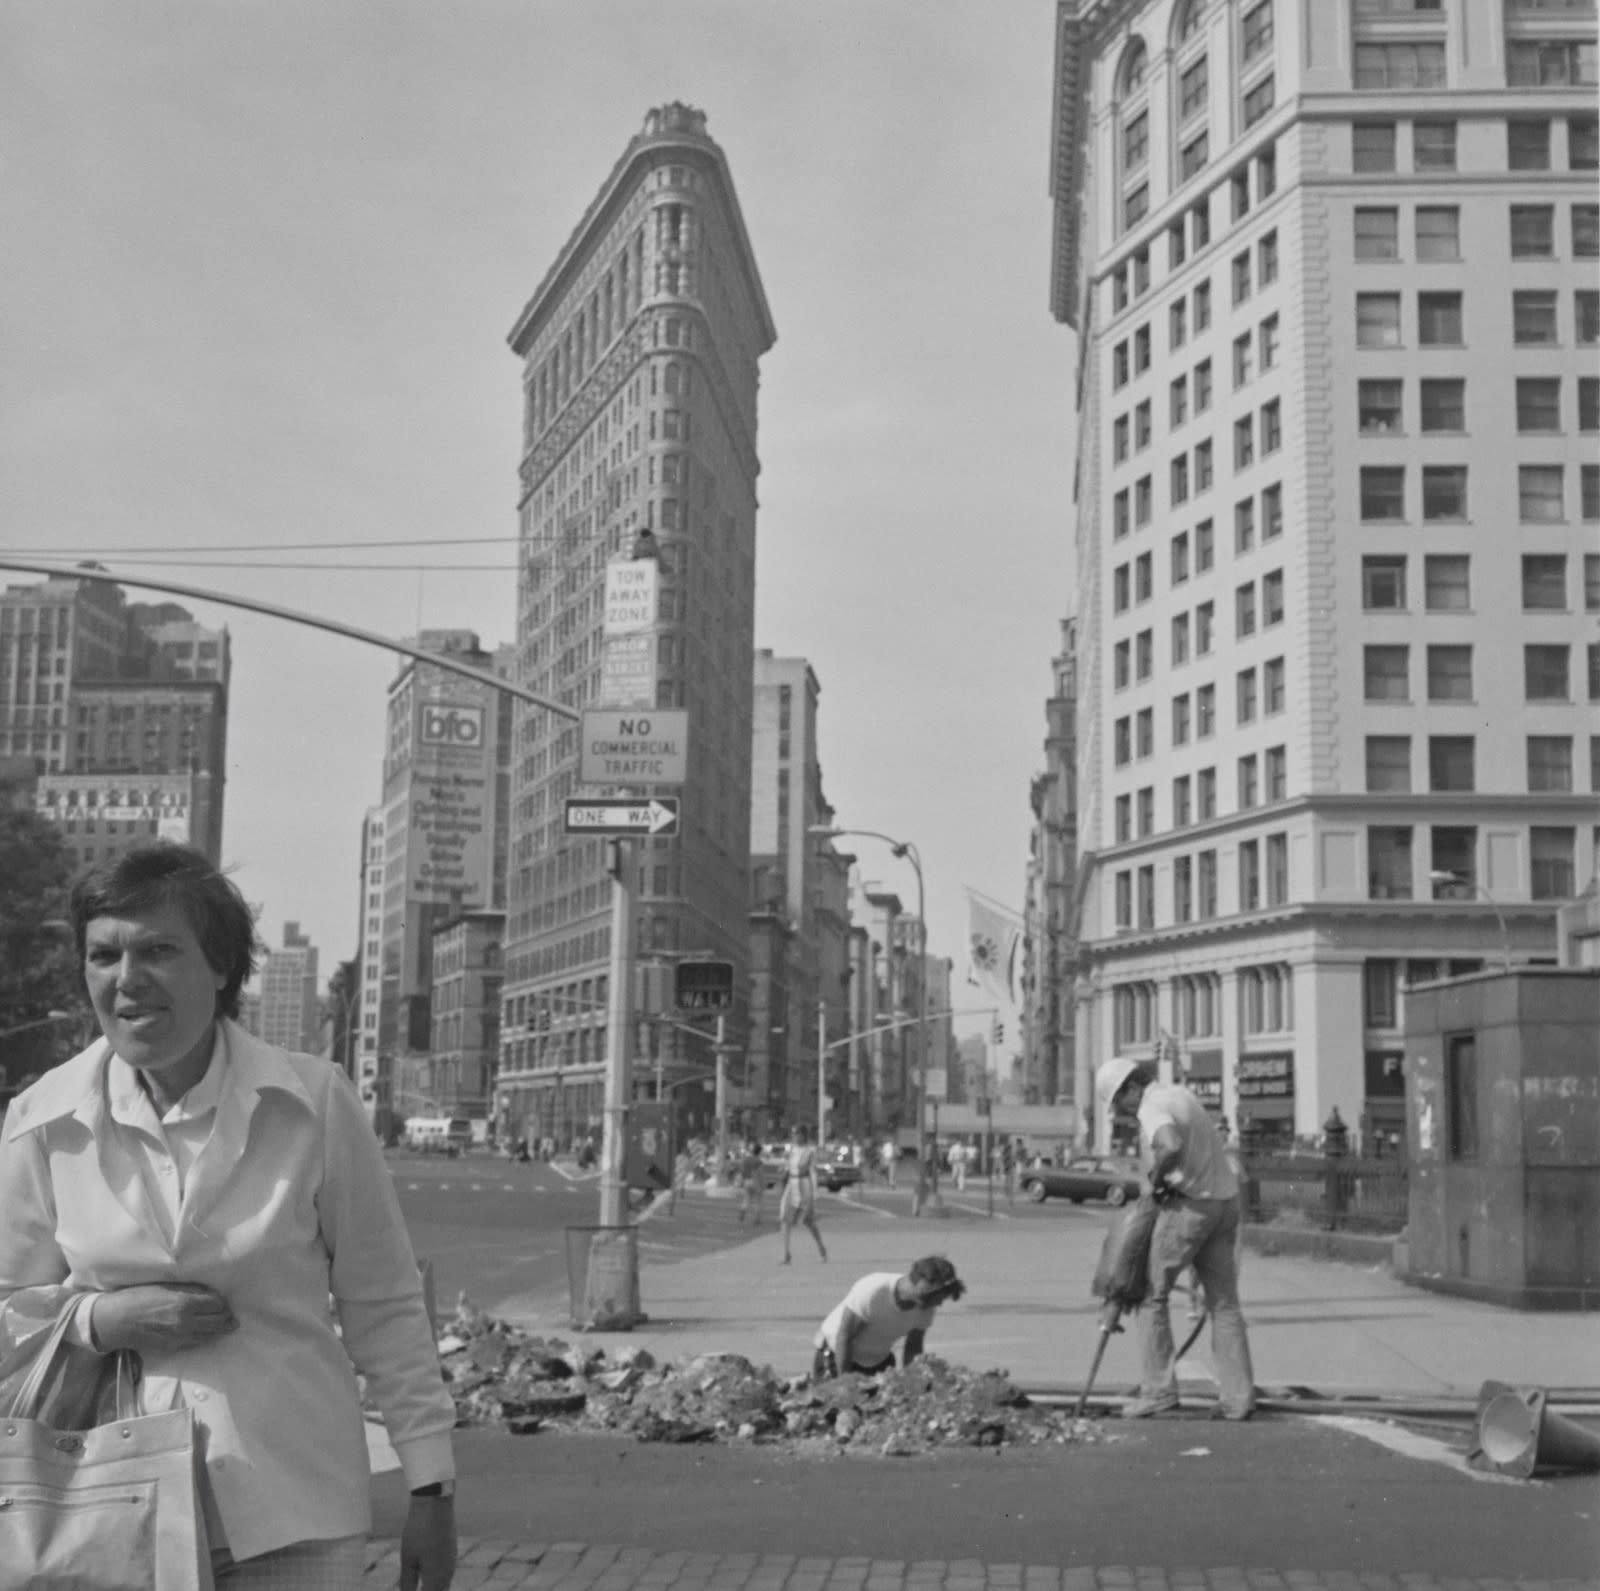 Steven Rifkin, Untitled, NYC, 1981